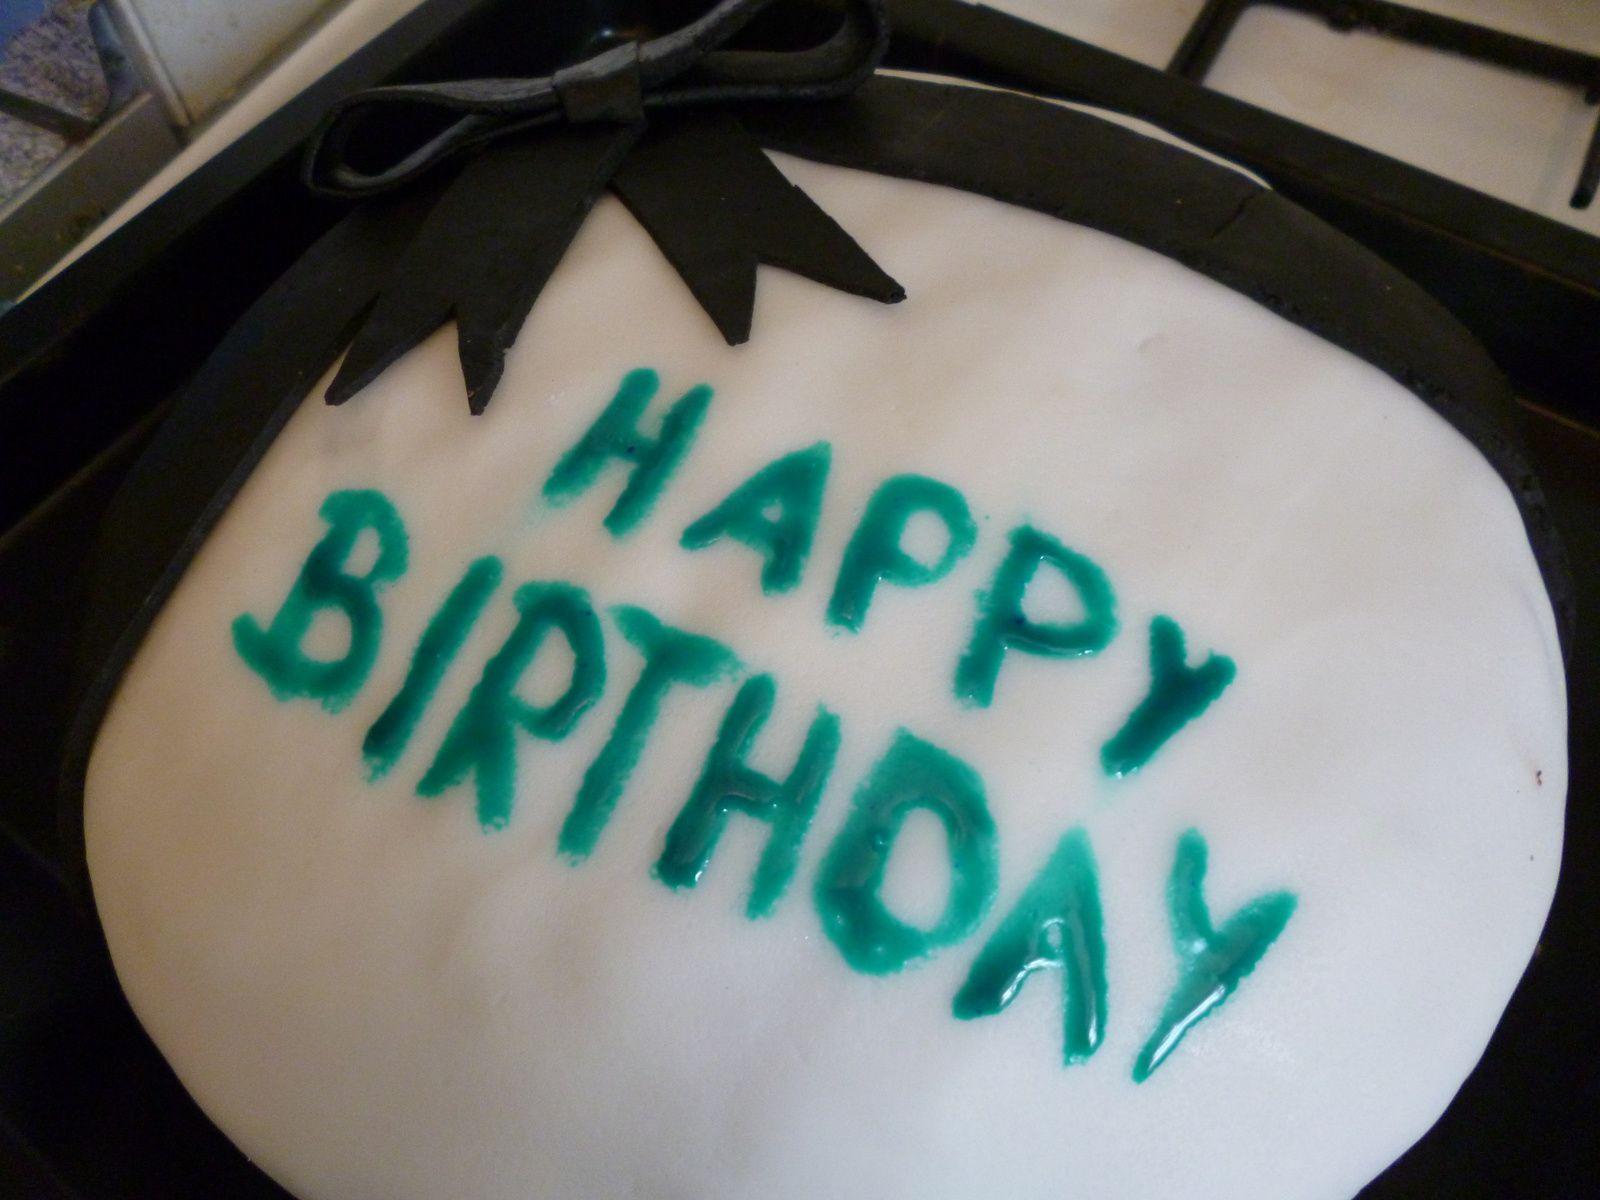 Regenbogen-Geburtstags-Kuchen